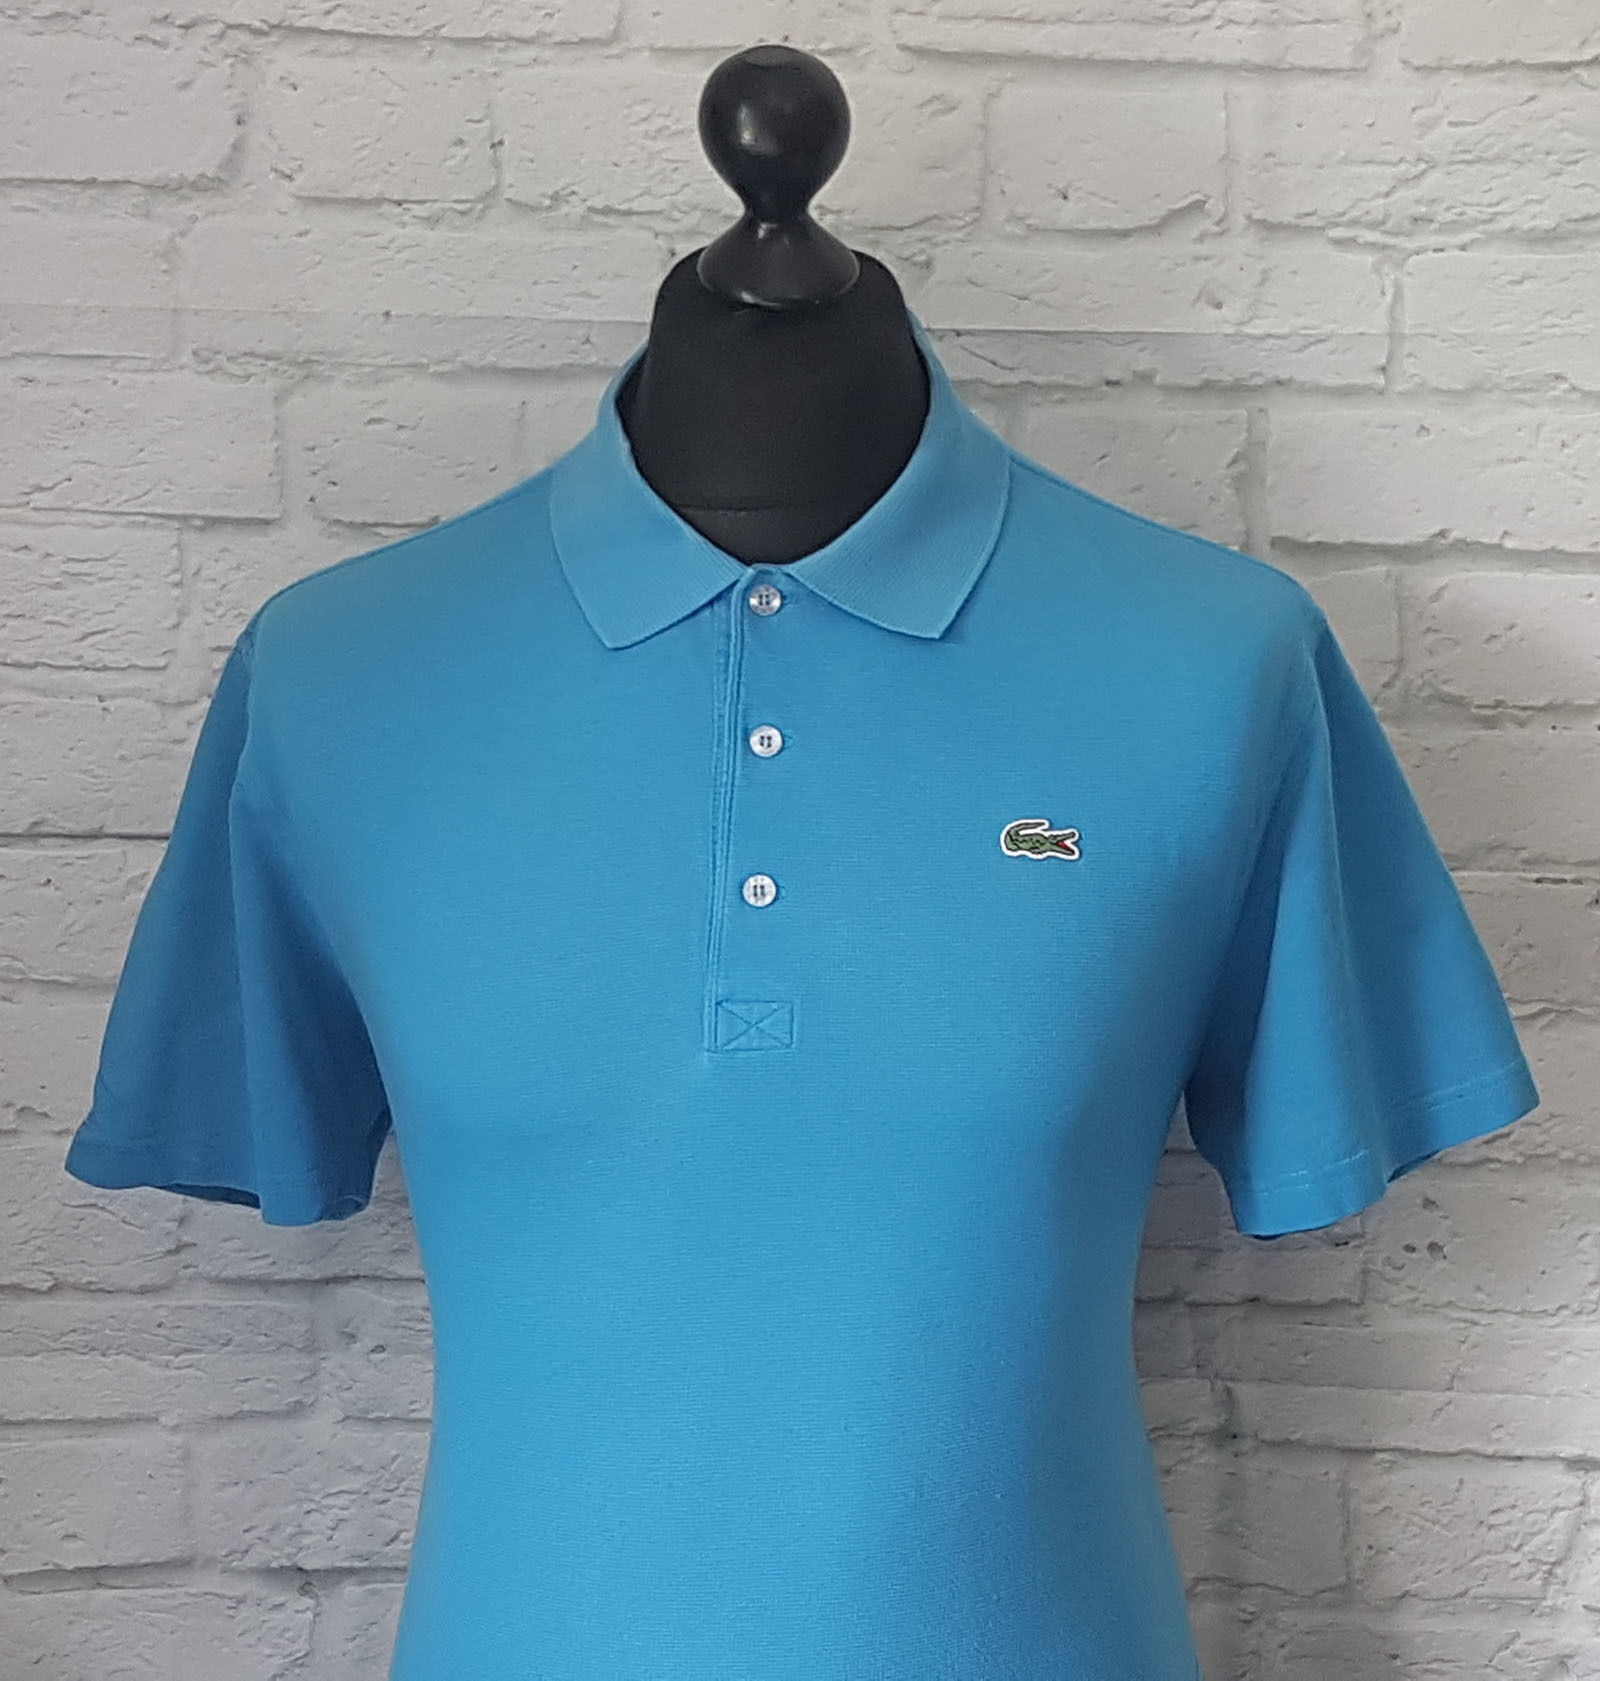 Lacoste sport men 39 s vintage devanlay vibrant blue polo for Lacoste size 4 polo shirt